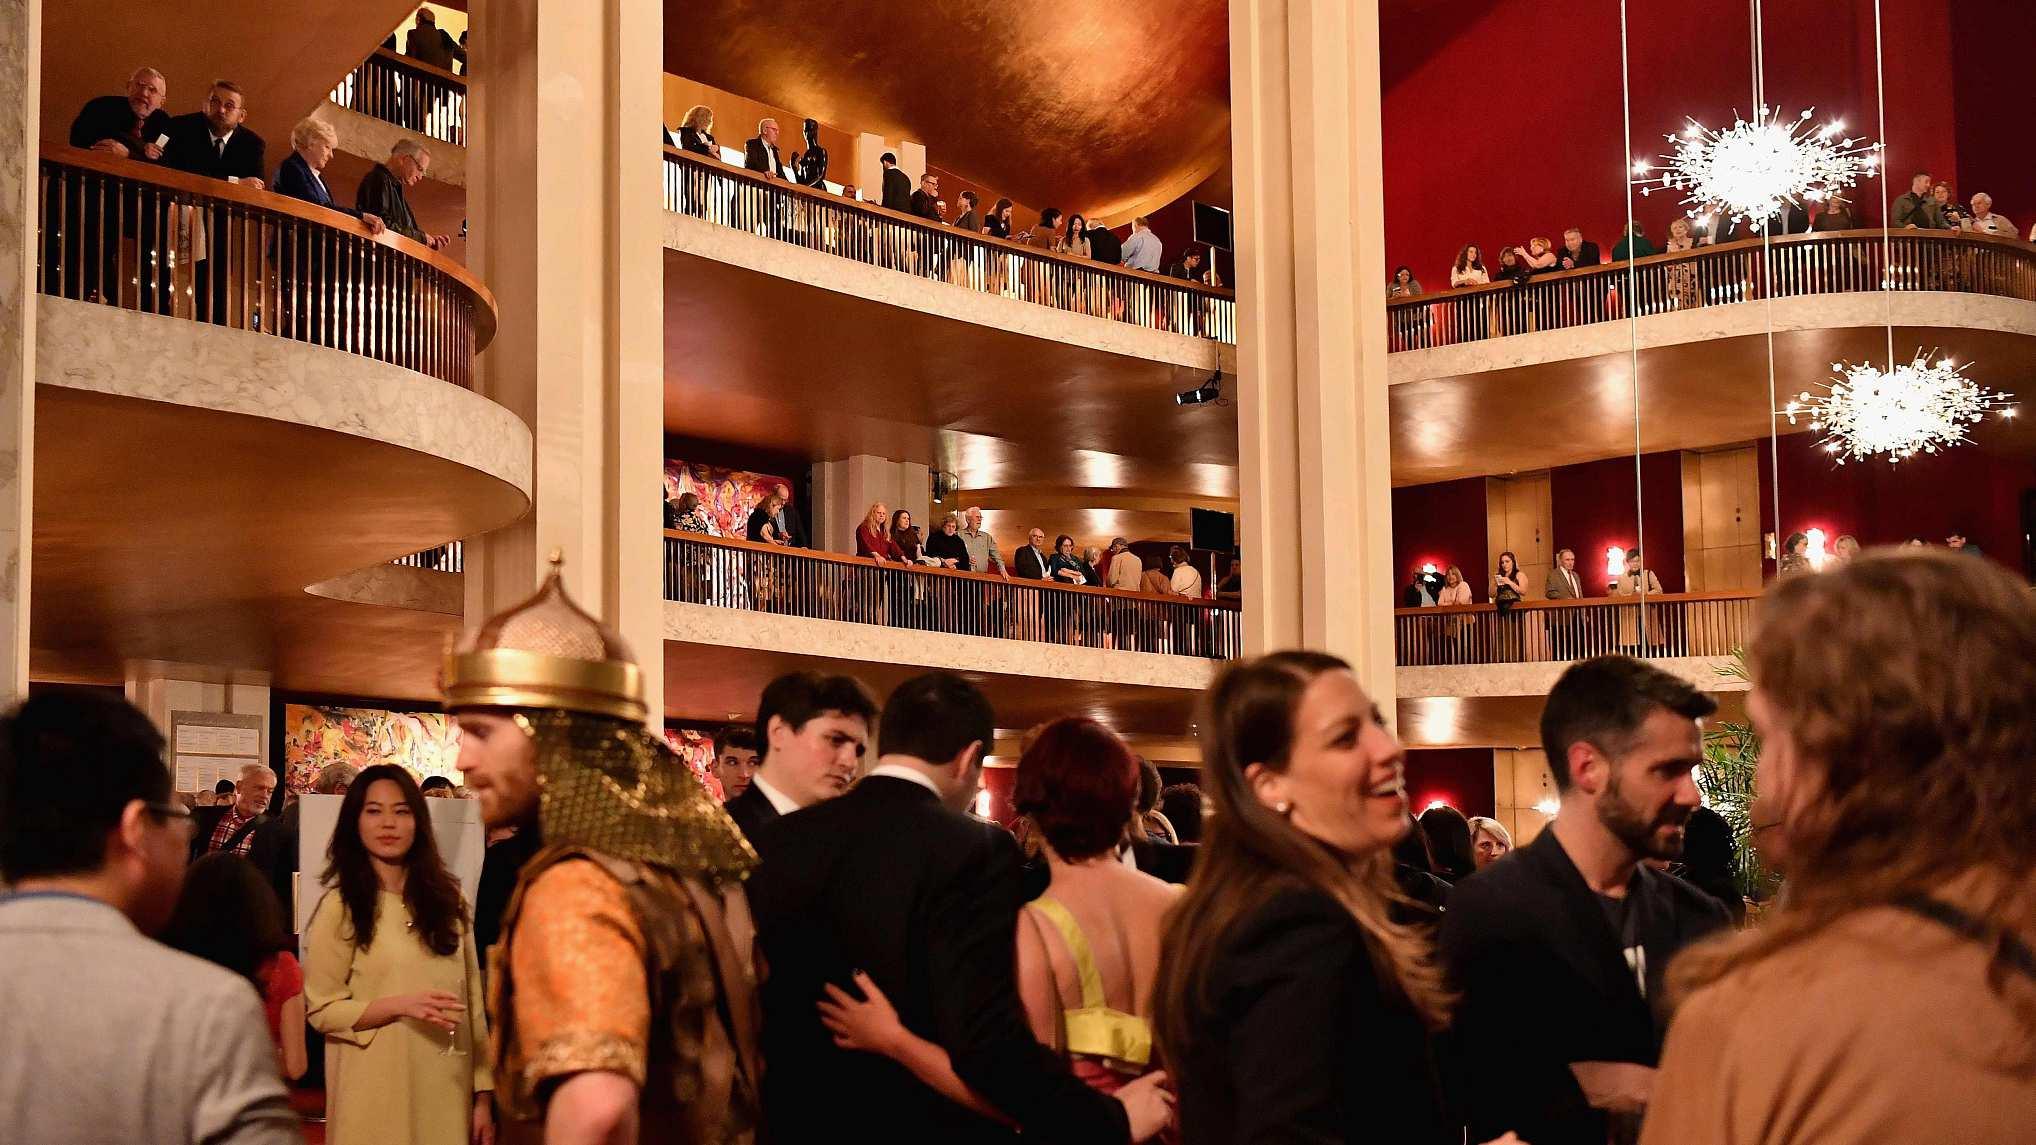 Hard sell? Met Opera aims to lure millennials